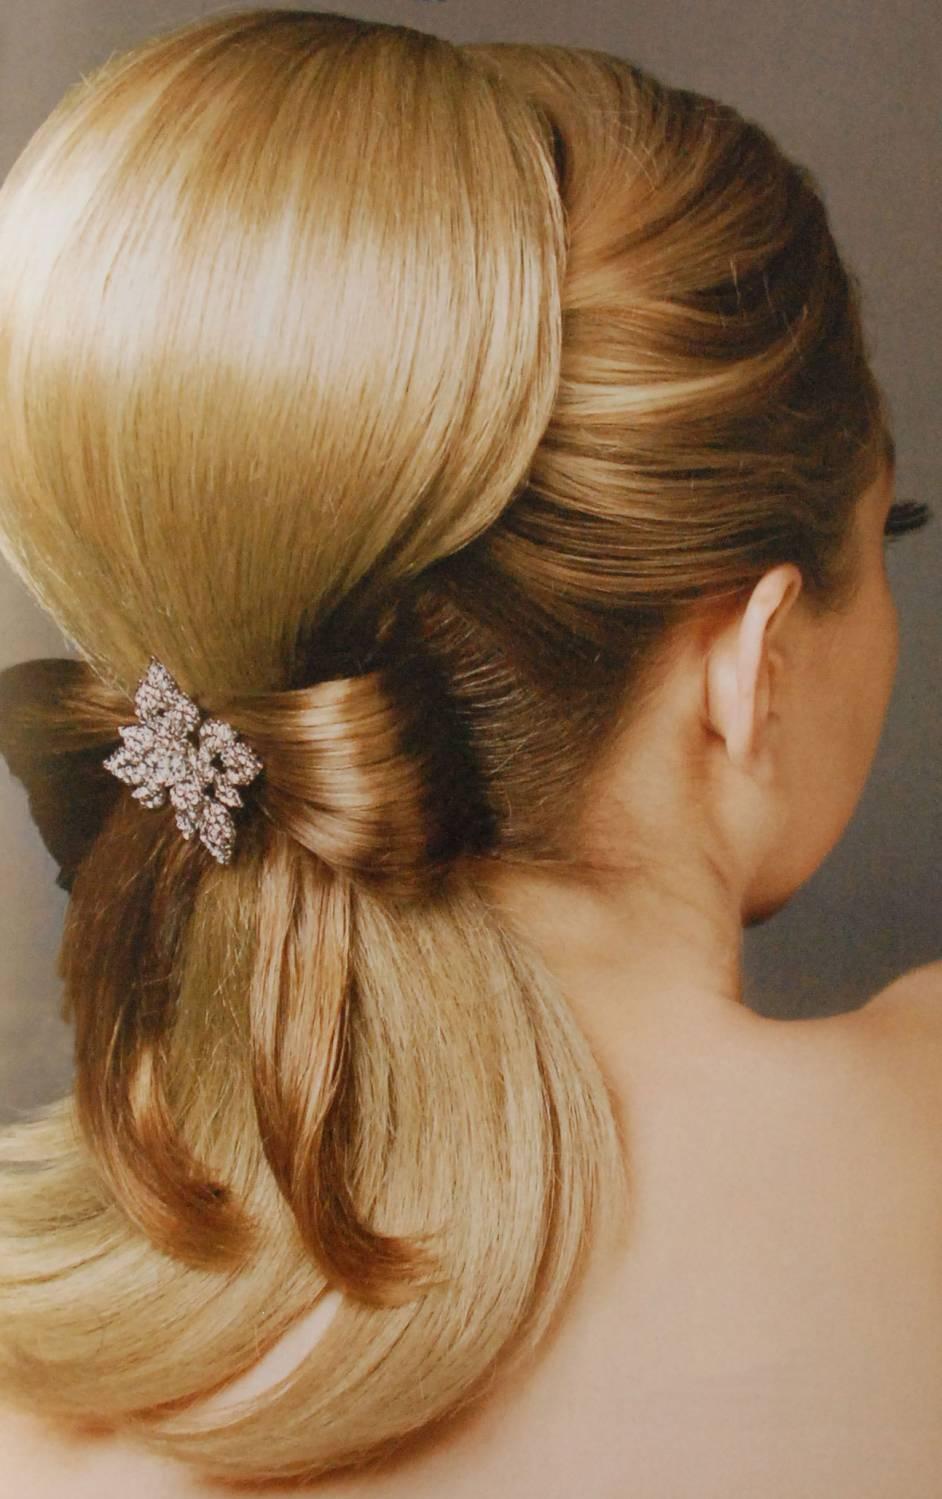 آرایش عروس - شینیون عروس - میکاپ عروس